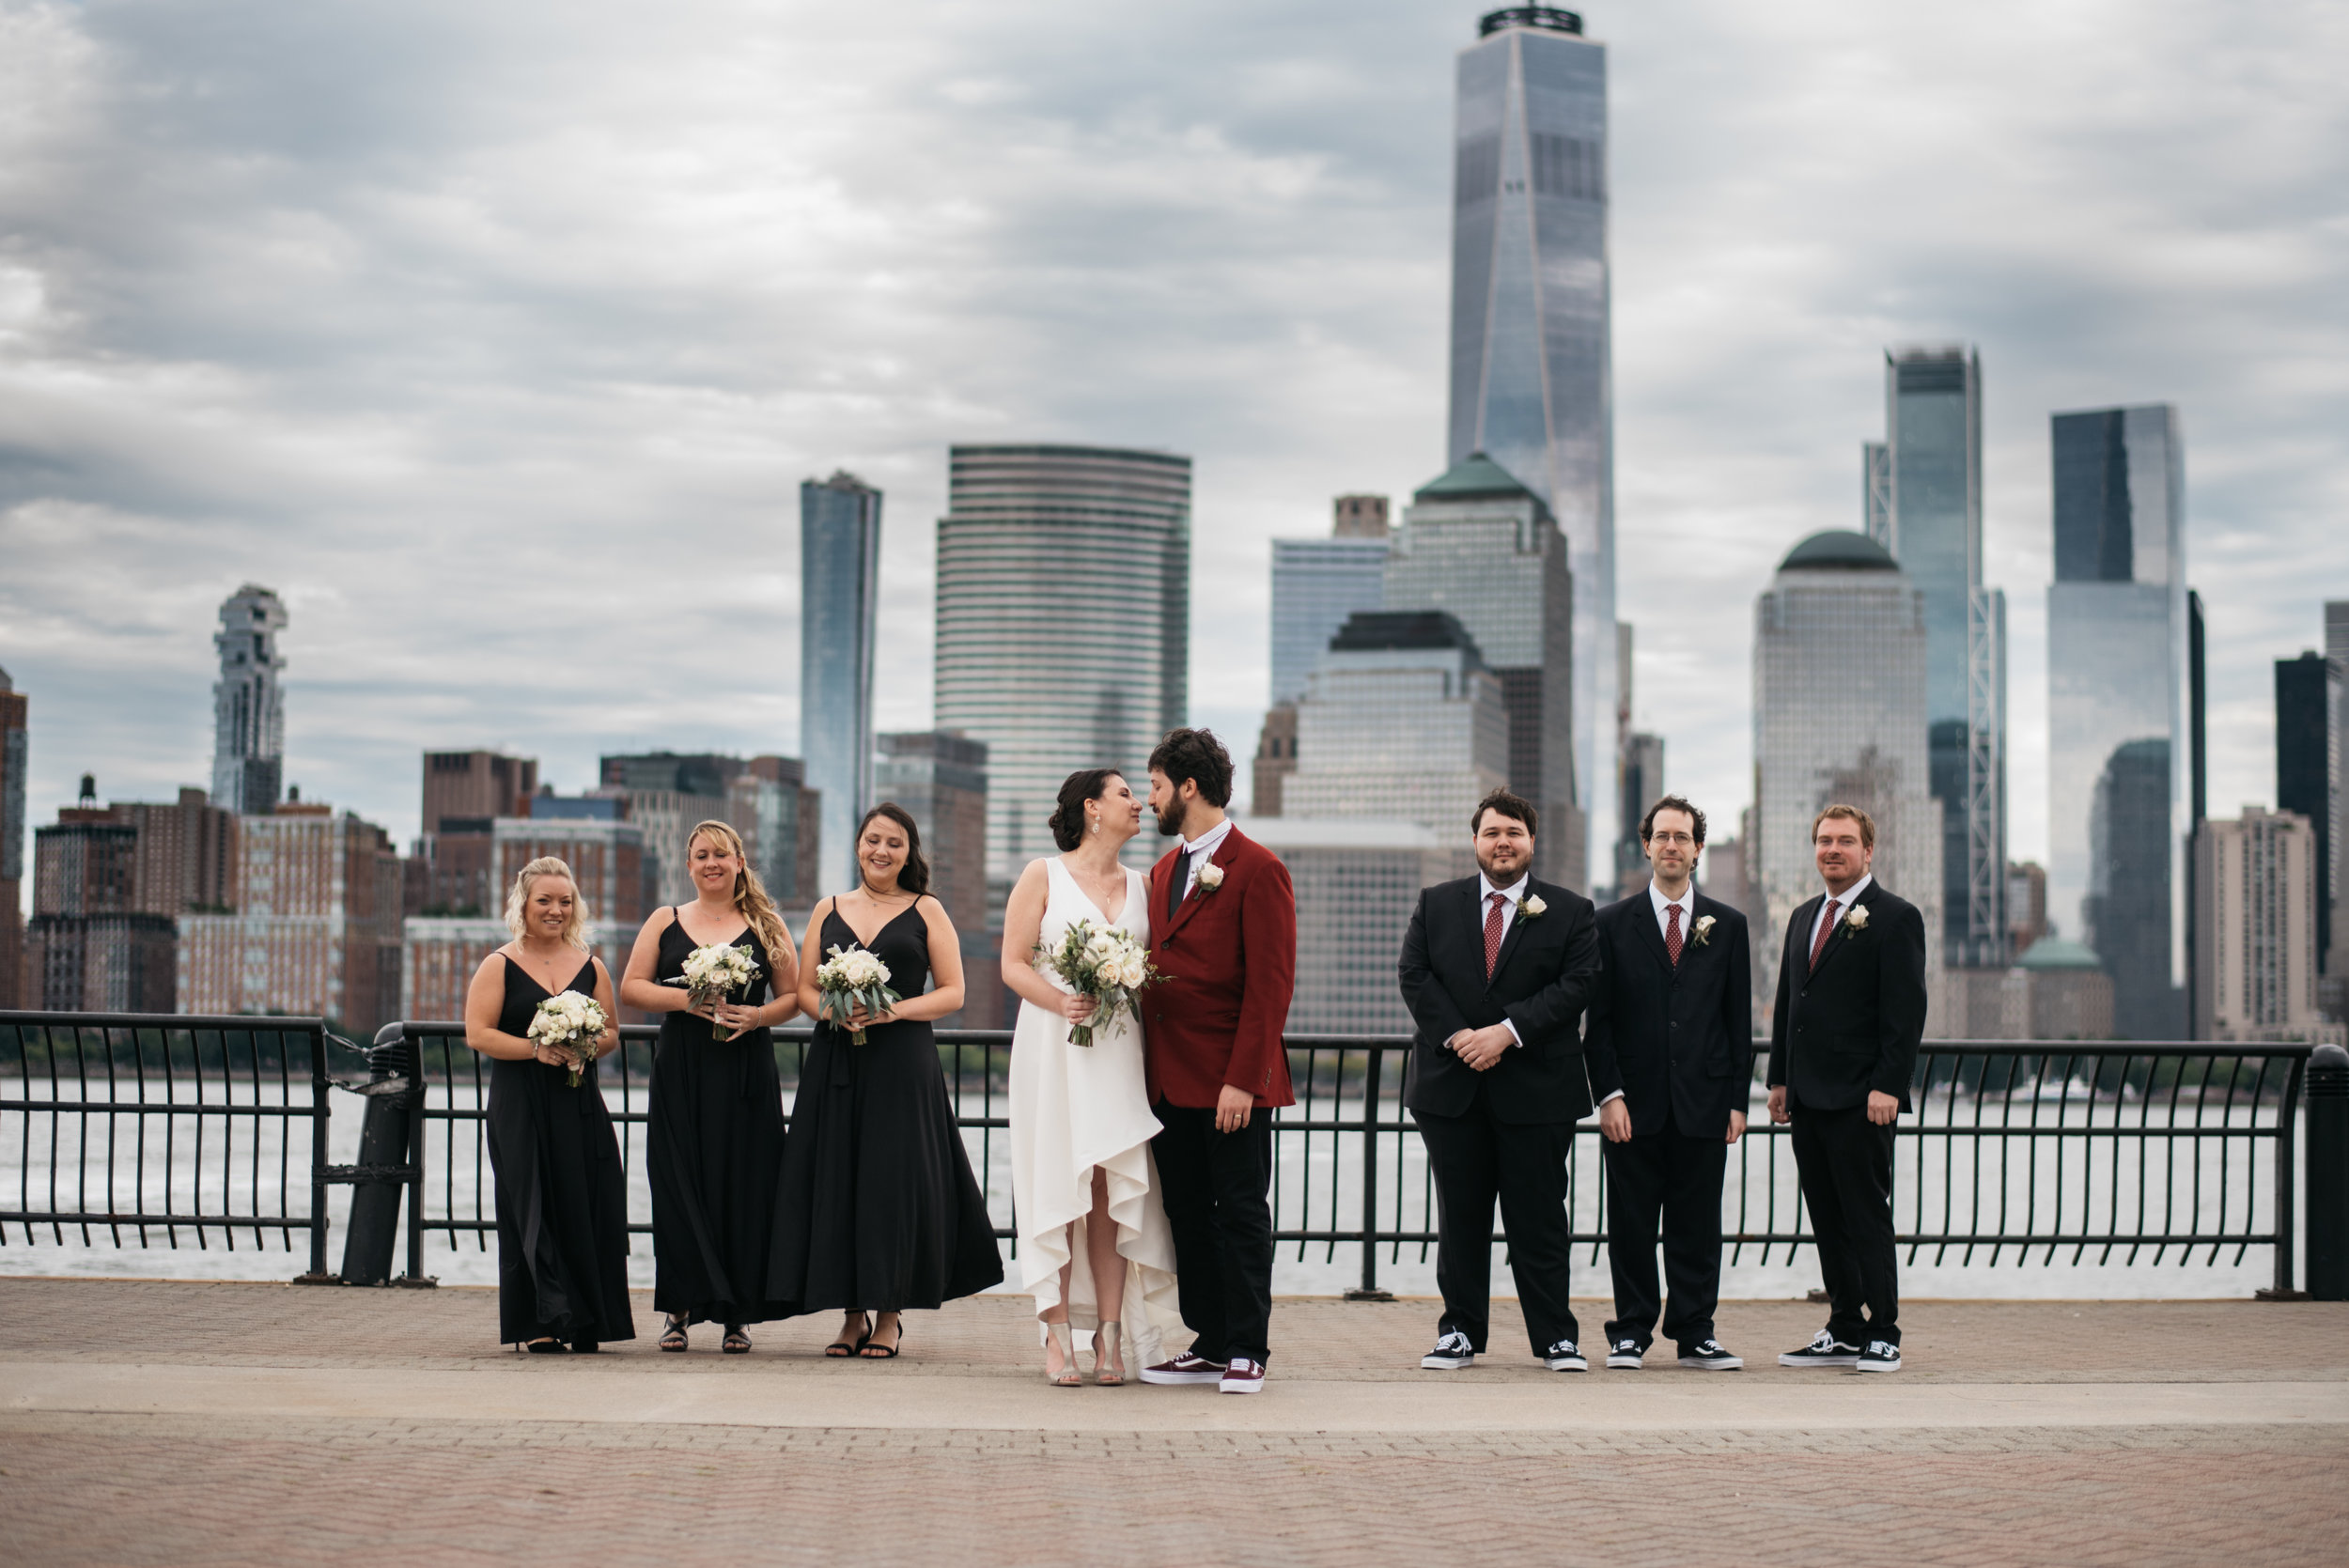 WeddingPhotos | NJPhotographer | Highlights-8-22.jpg